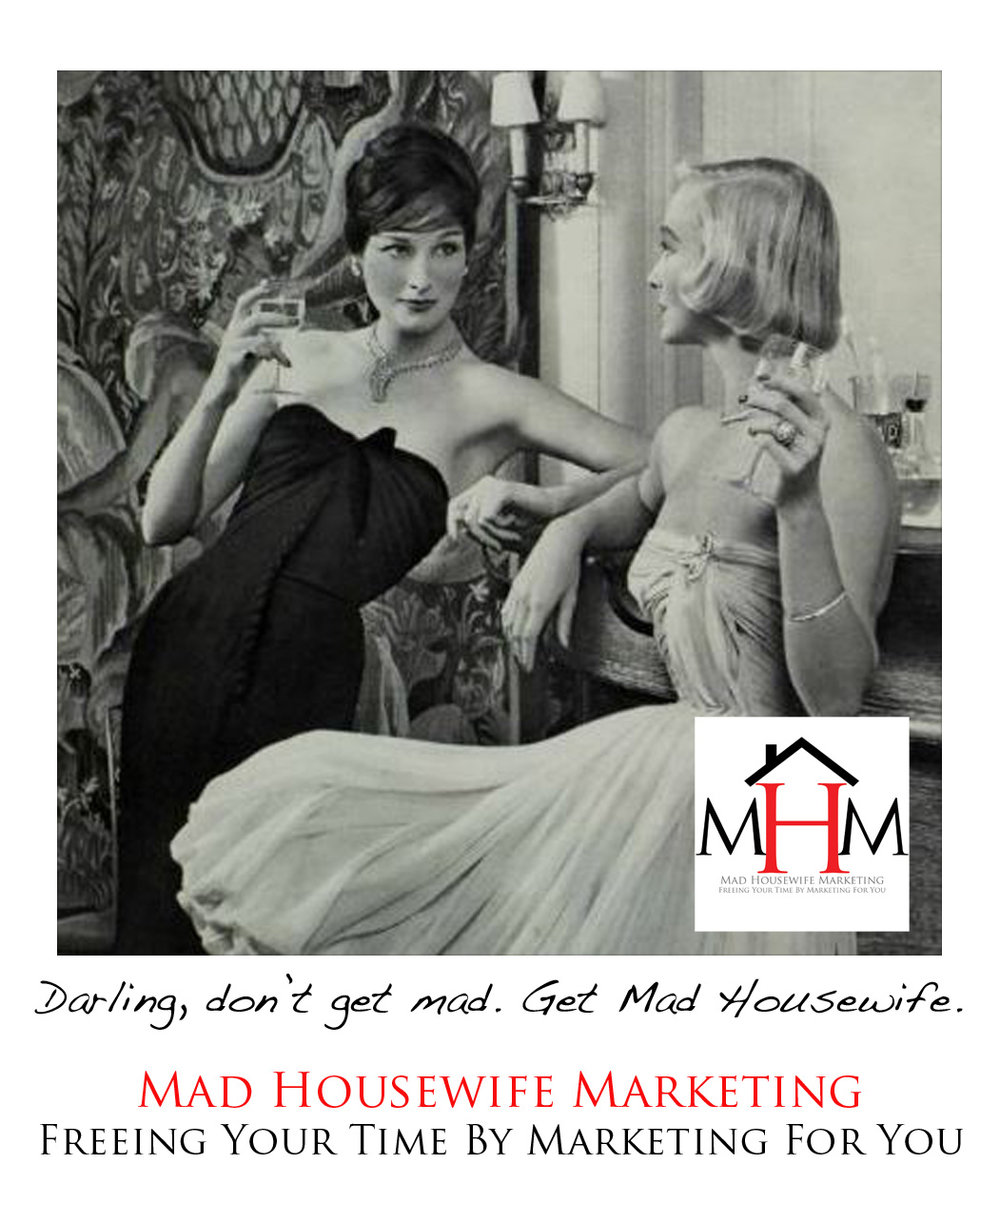 MHM Ad 1.jpg